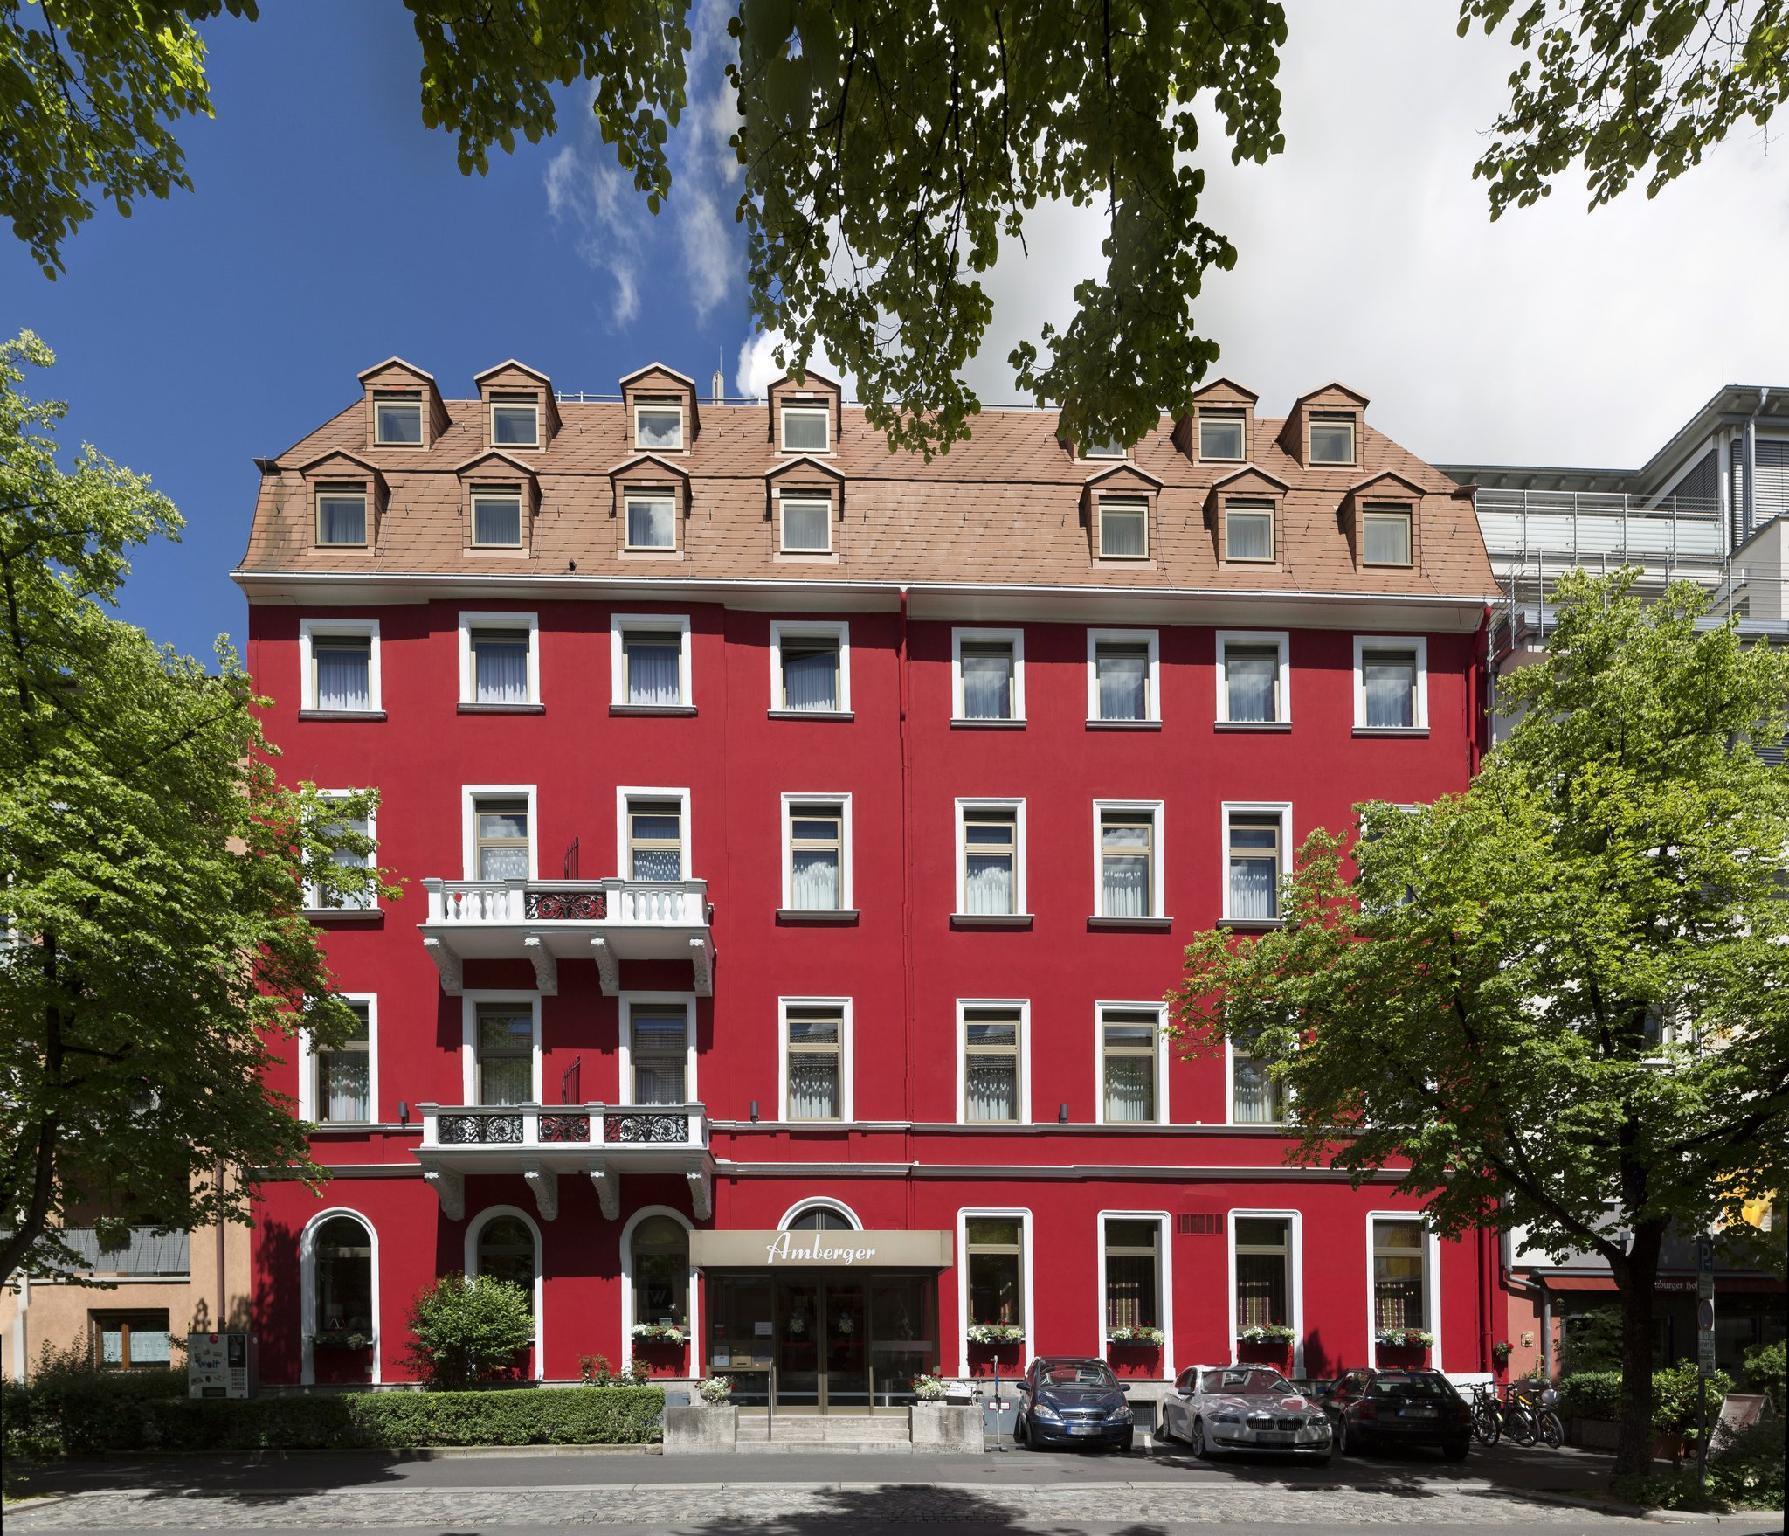 TOP Hotel Amberger, Würzburg